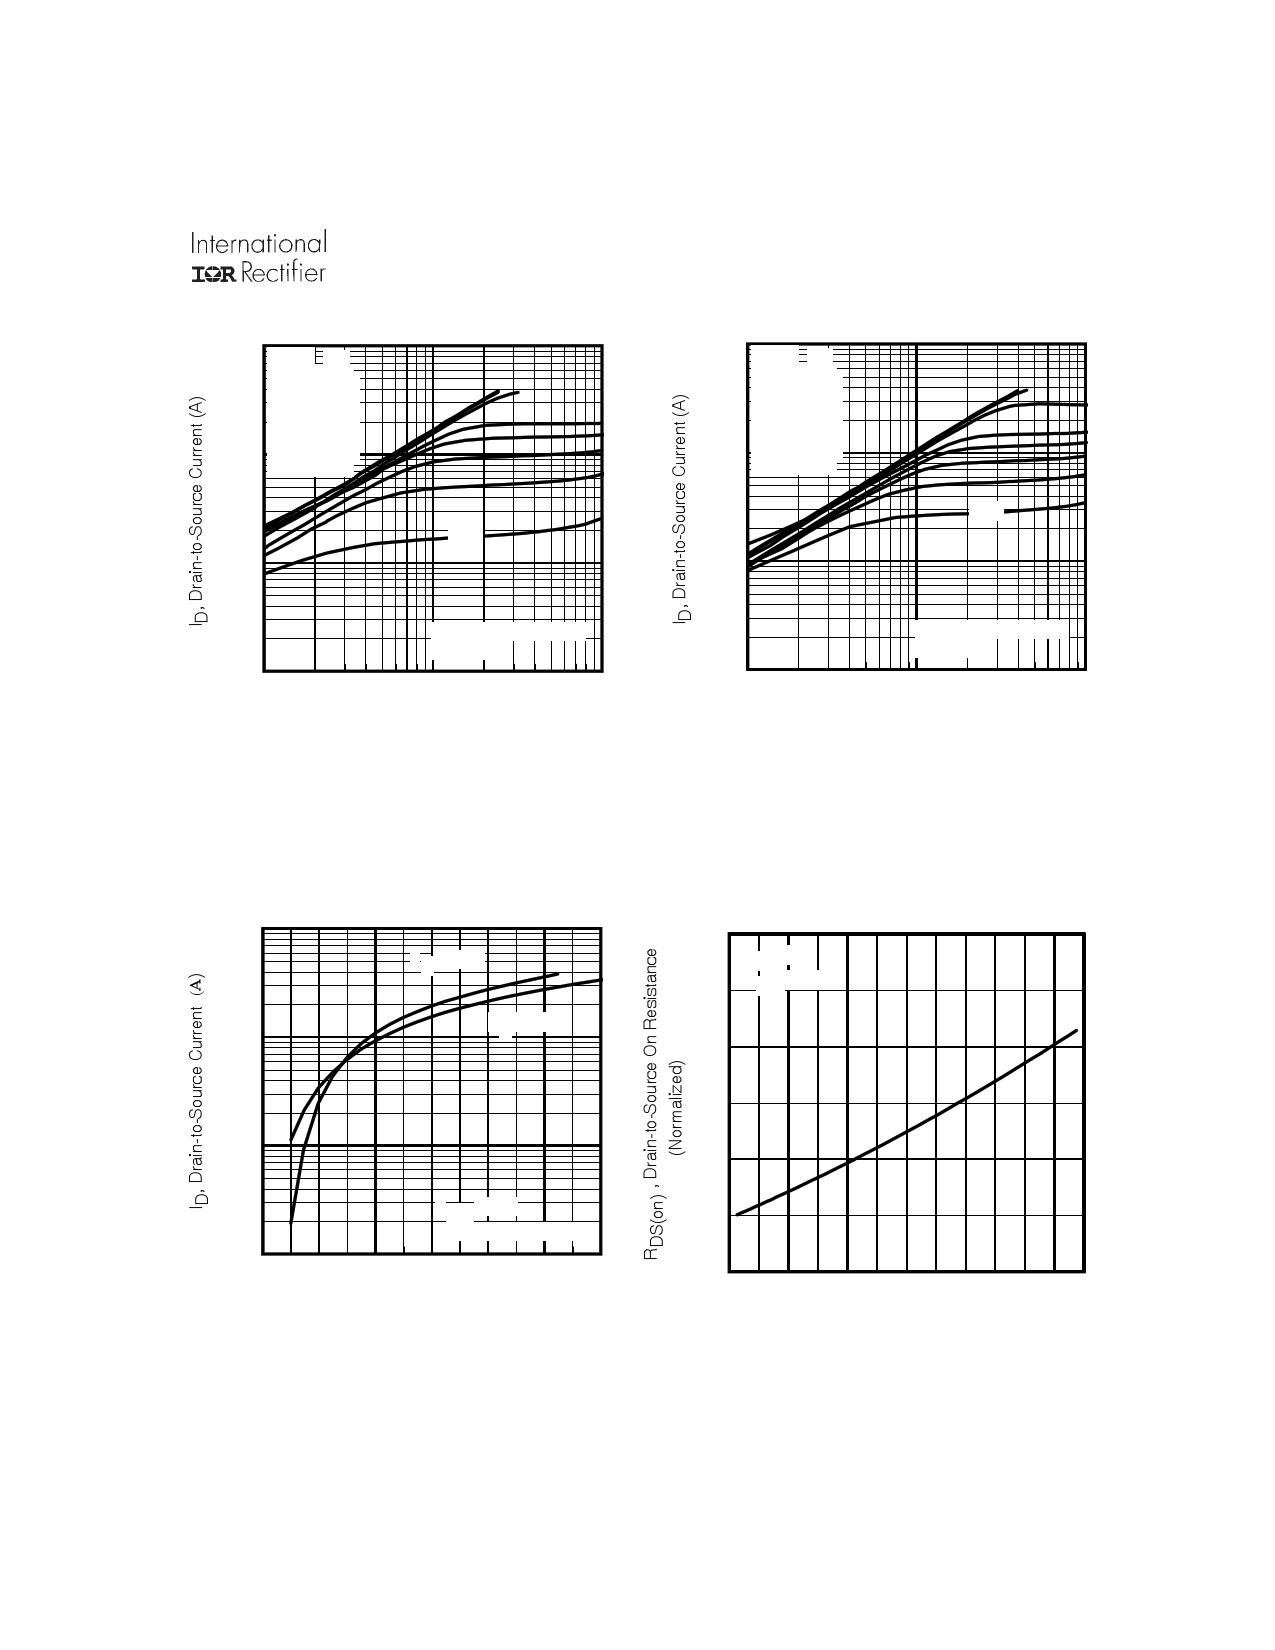 IRF3711ZSPbF pdf, ピン配列